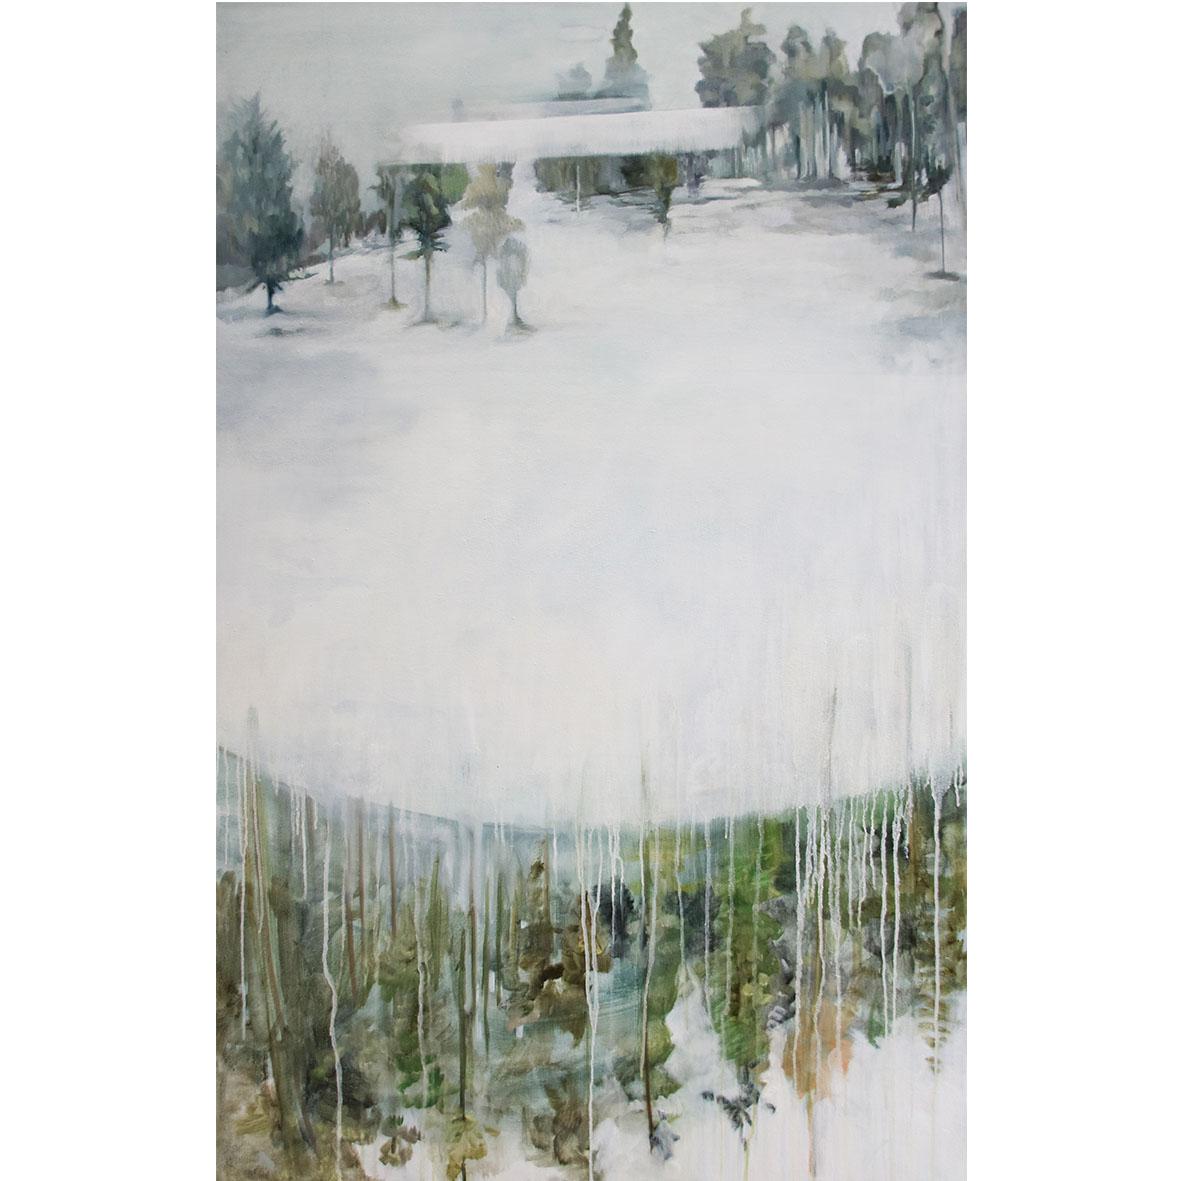 Desrae Chimes Saacks, Cliffside, 2017, oil on canvas, 90 x 140 cm